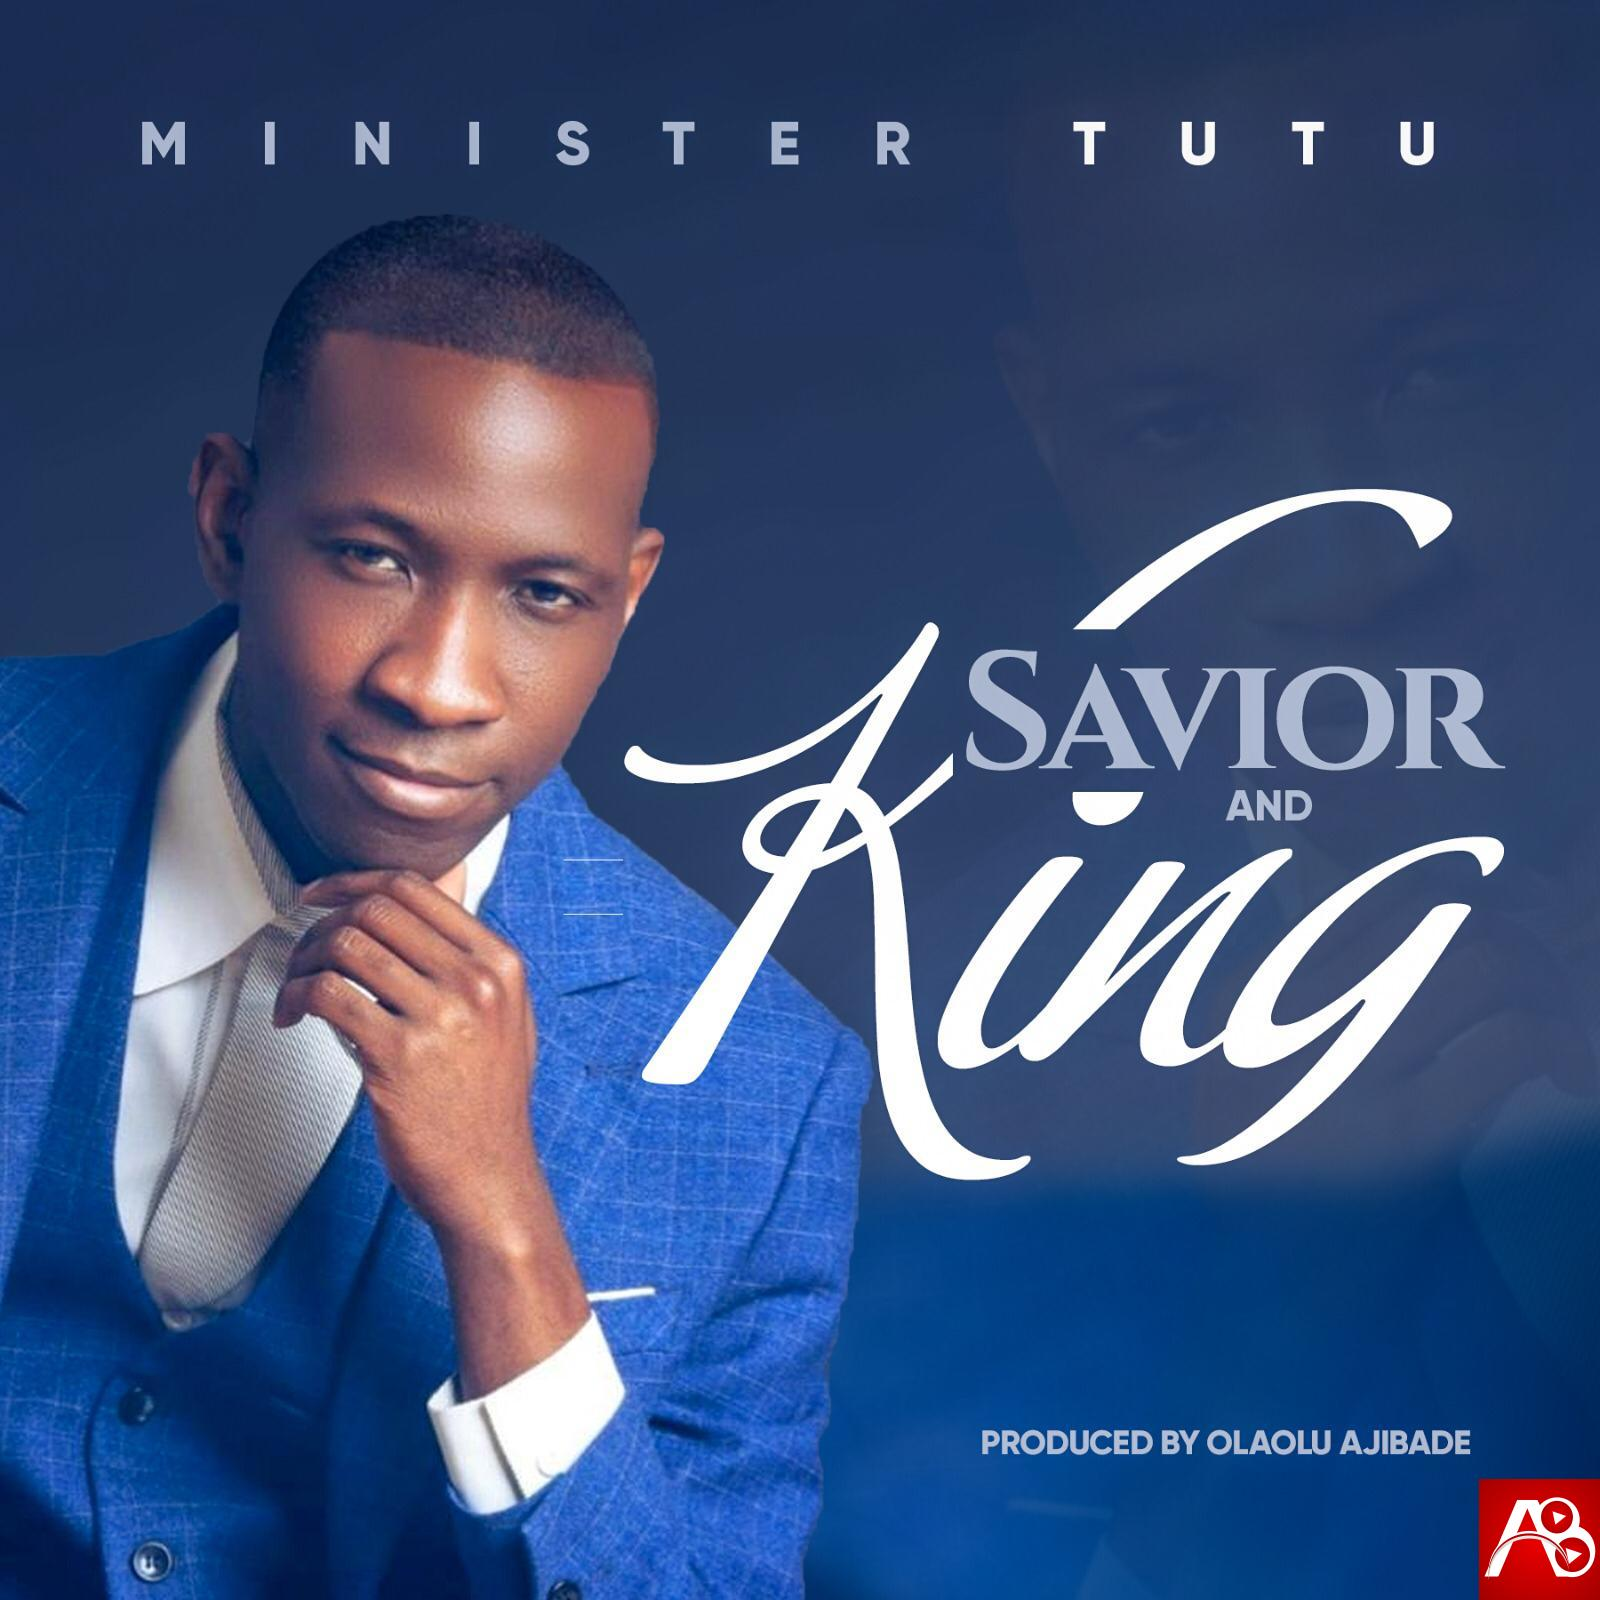 Minister Tutu - Savior and King